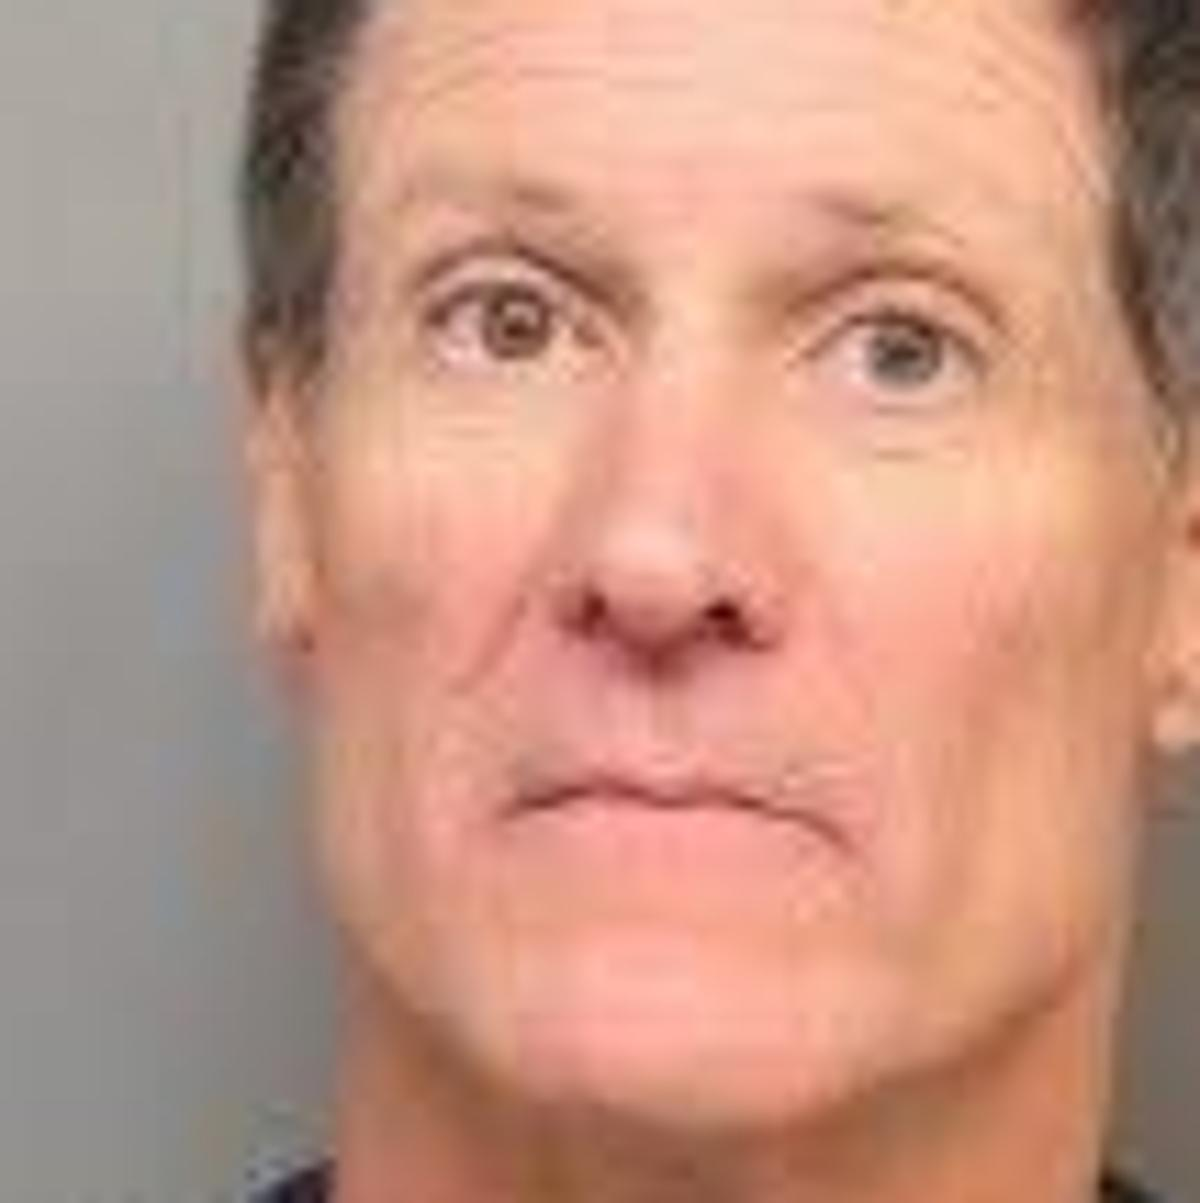 Former Husker jailed after allegedly striking pregnant woman at